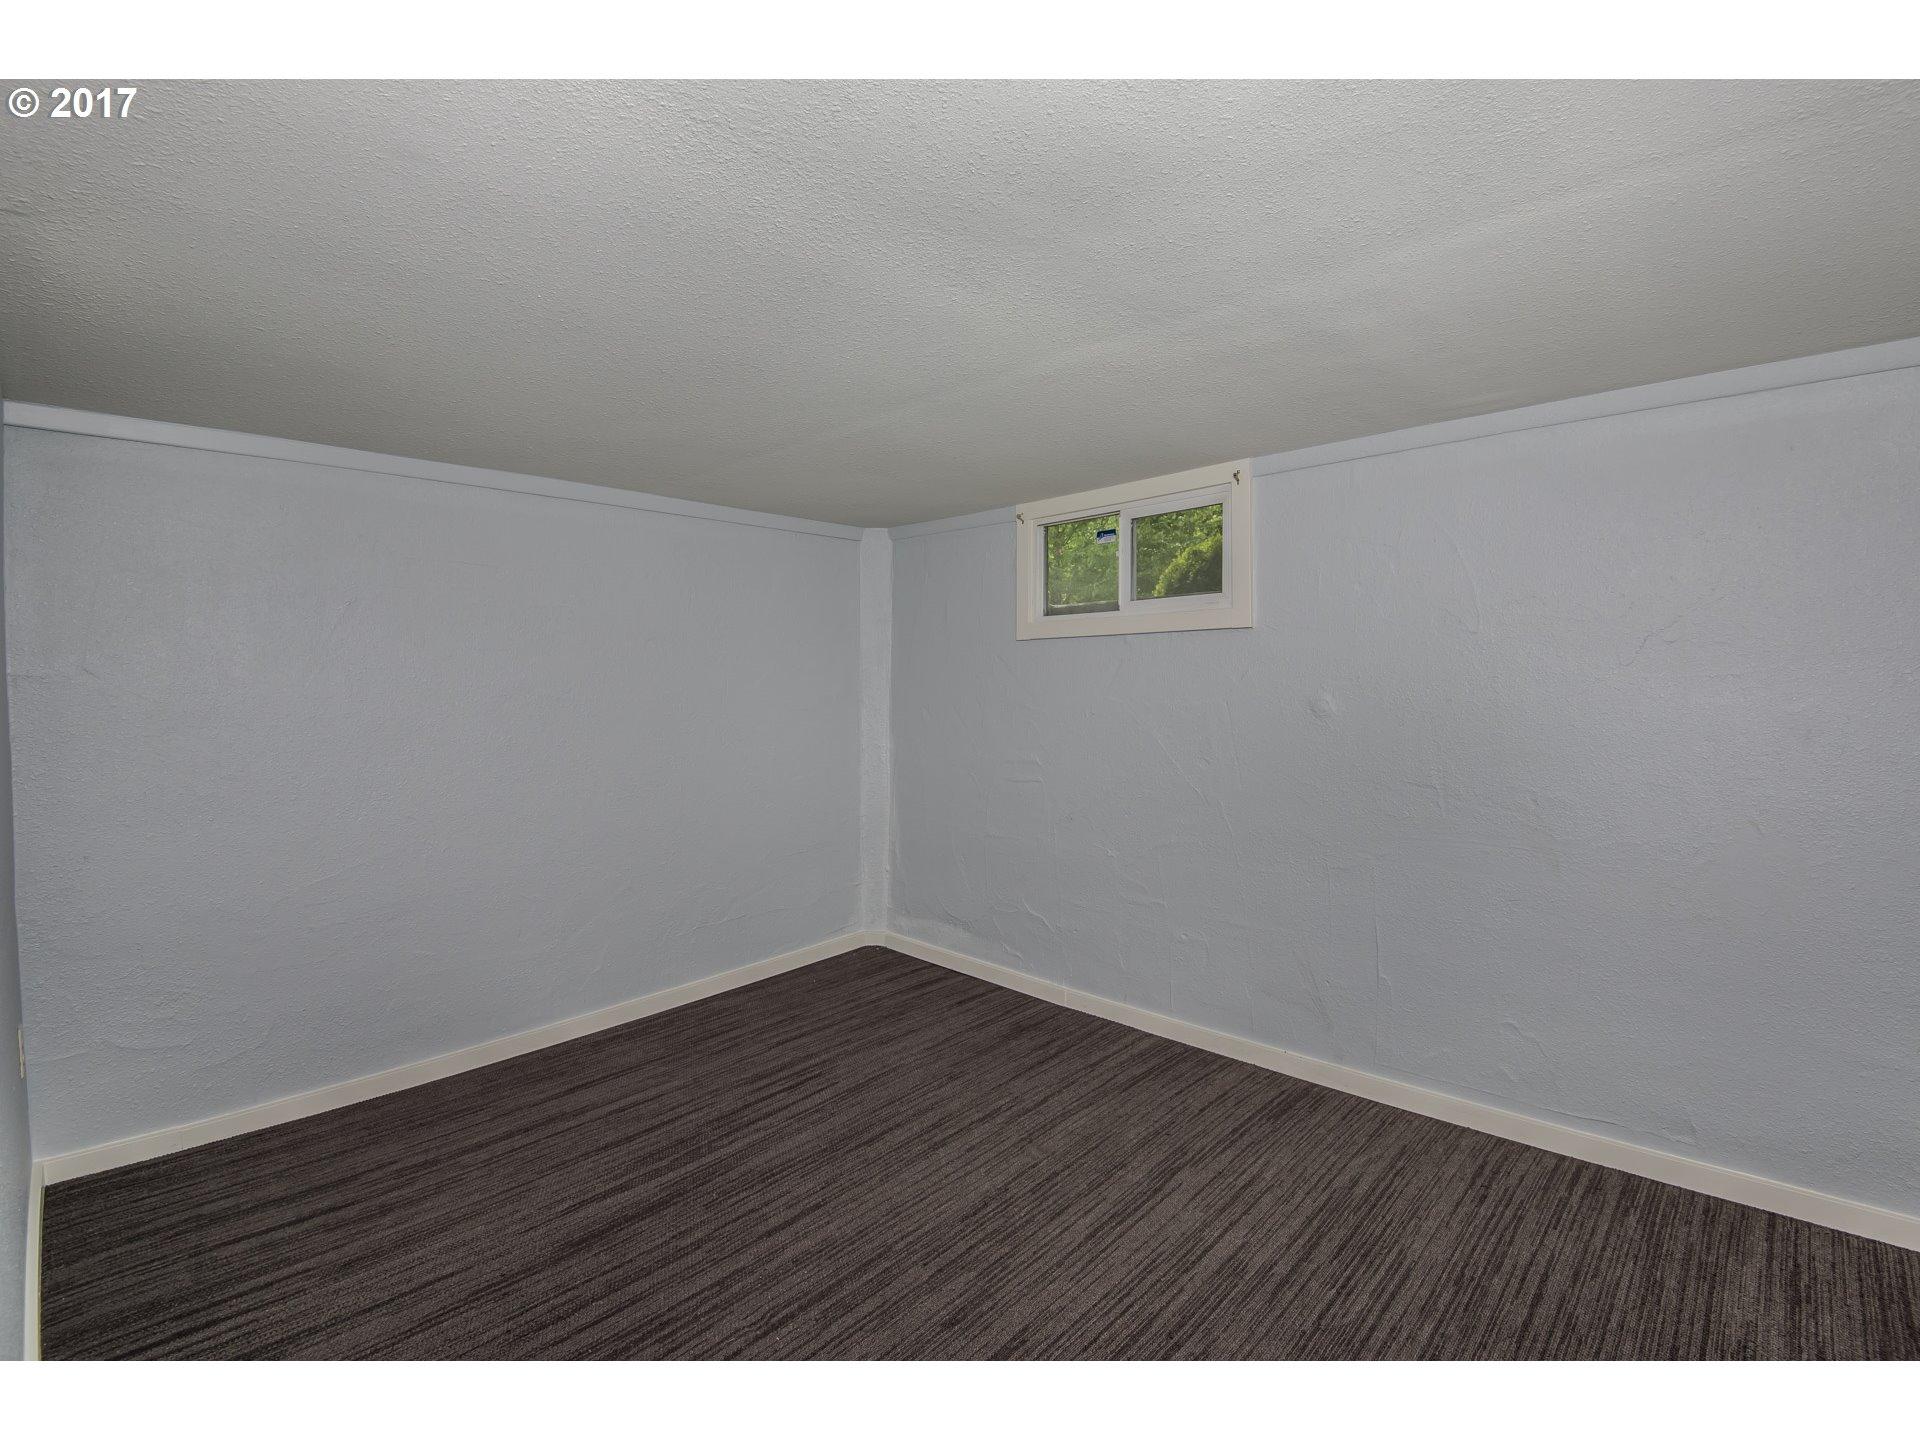 3016 NE 59TH AVE Portland, OR 97213 - MLS #: 17139716